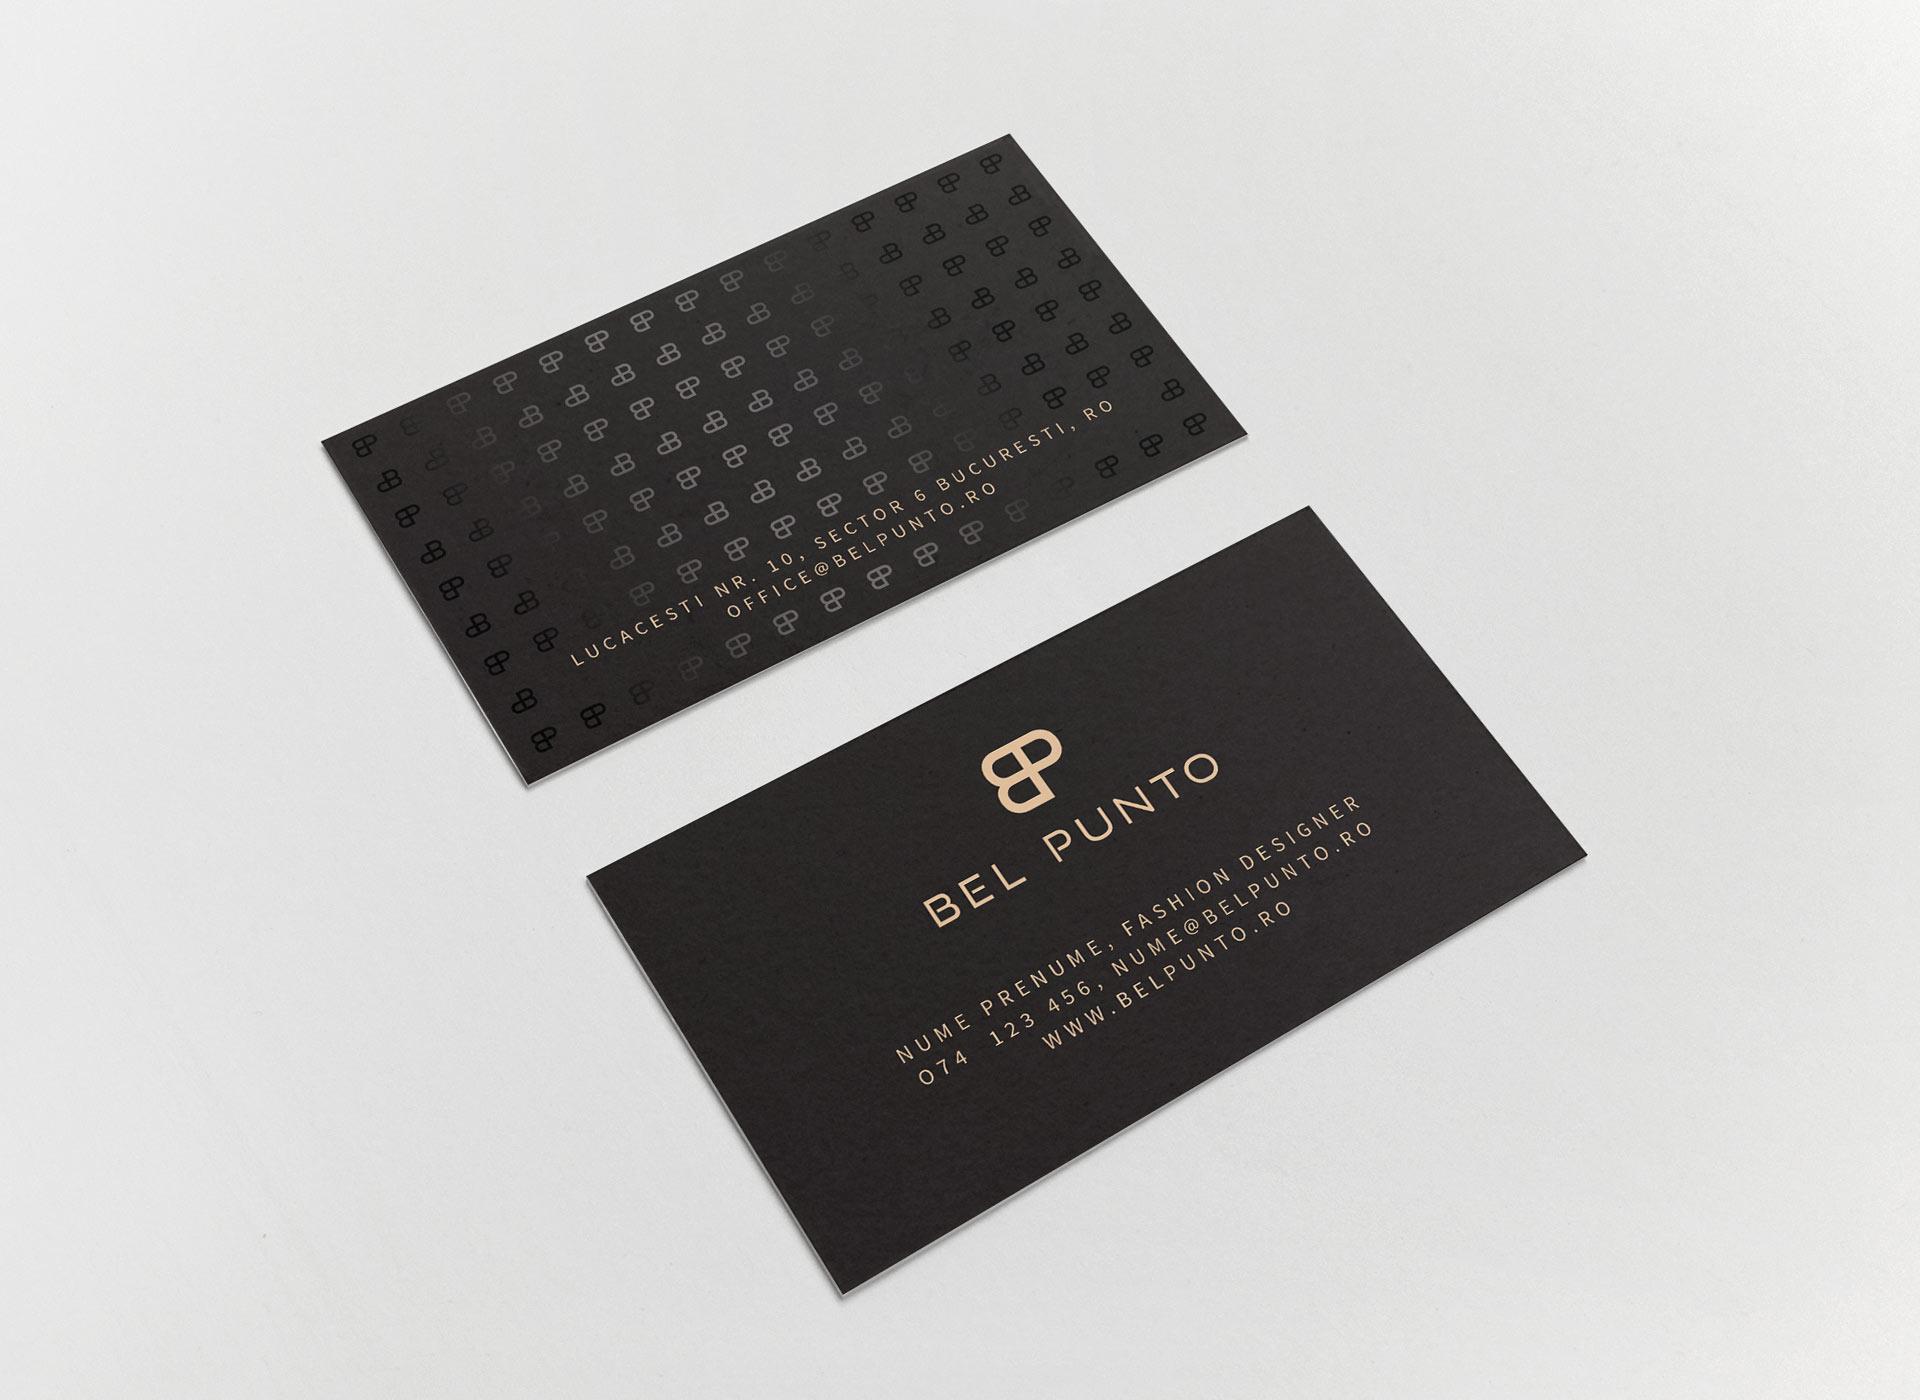 Bel Punto Business Card